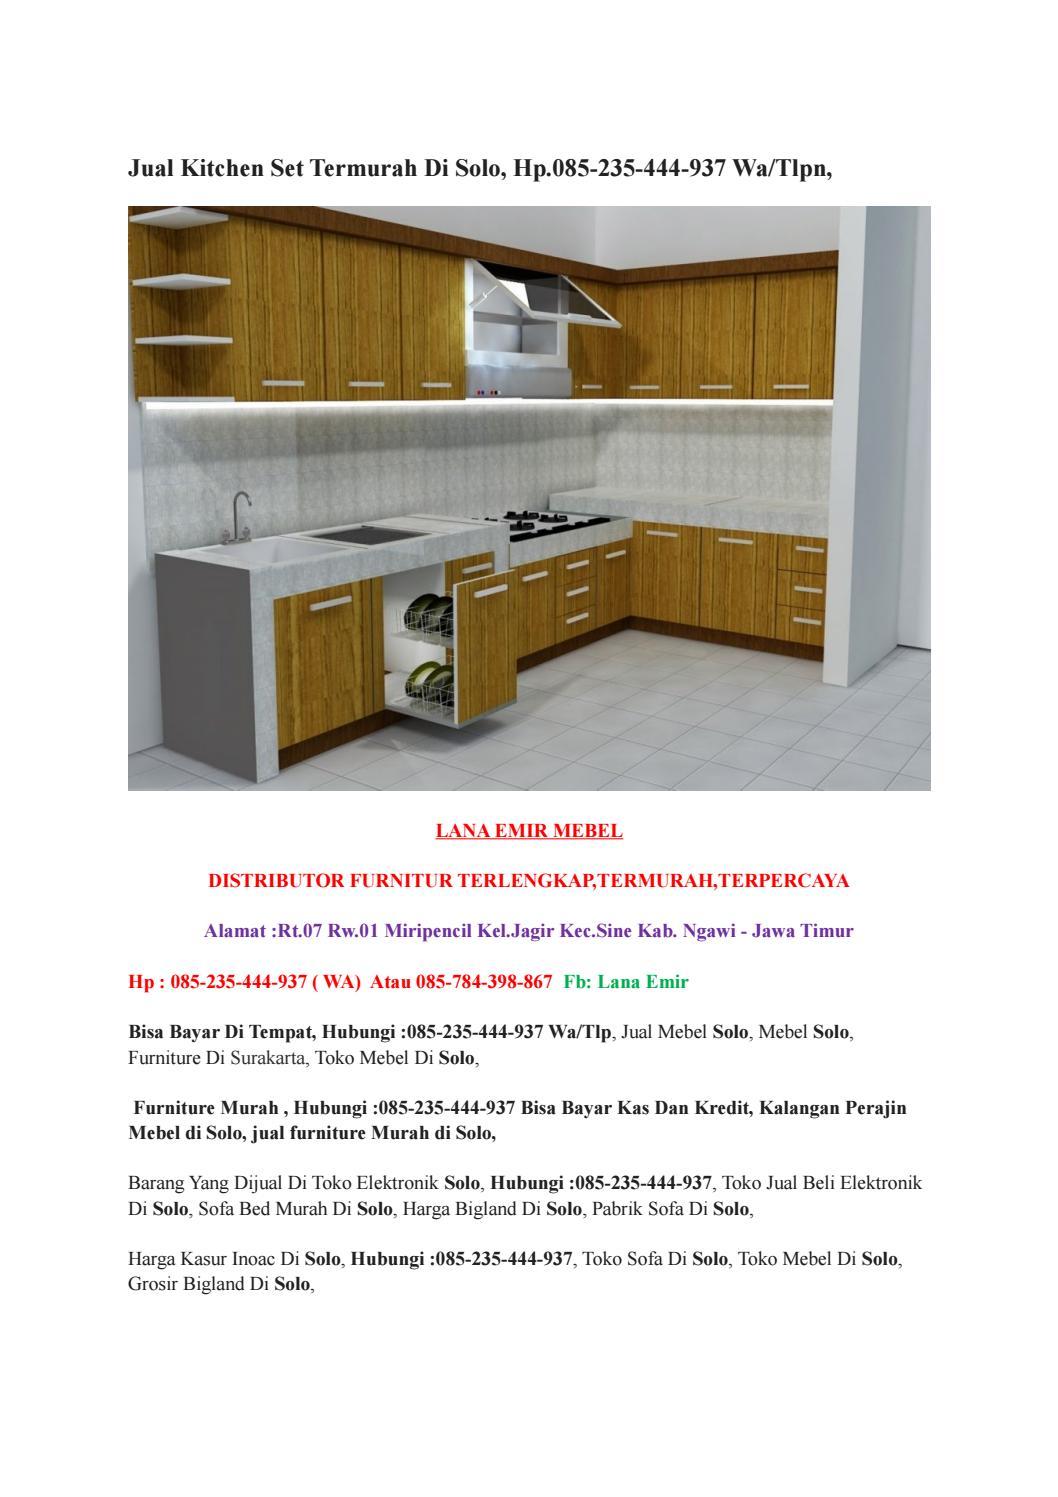 Jual Kitchen Set Termurah Di Solo Hp 085 235 444 937 Wa Tlpn By Mandiriputra Issuu